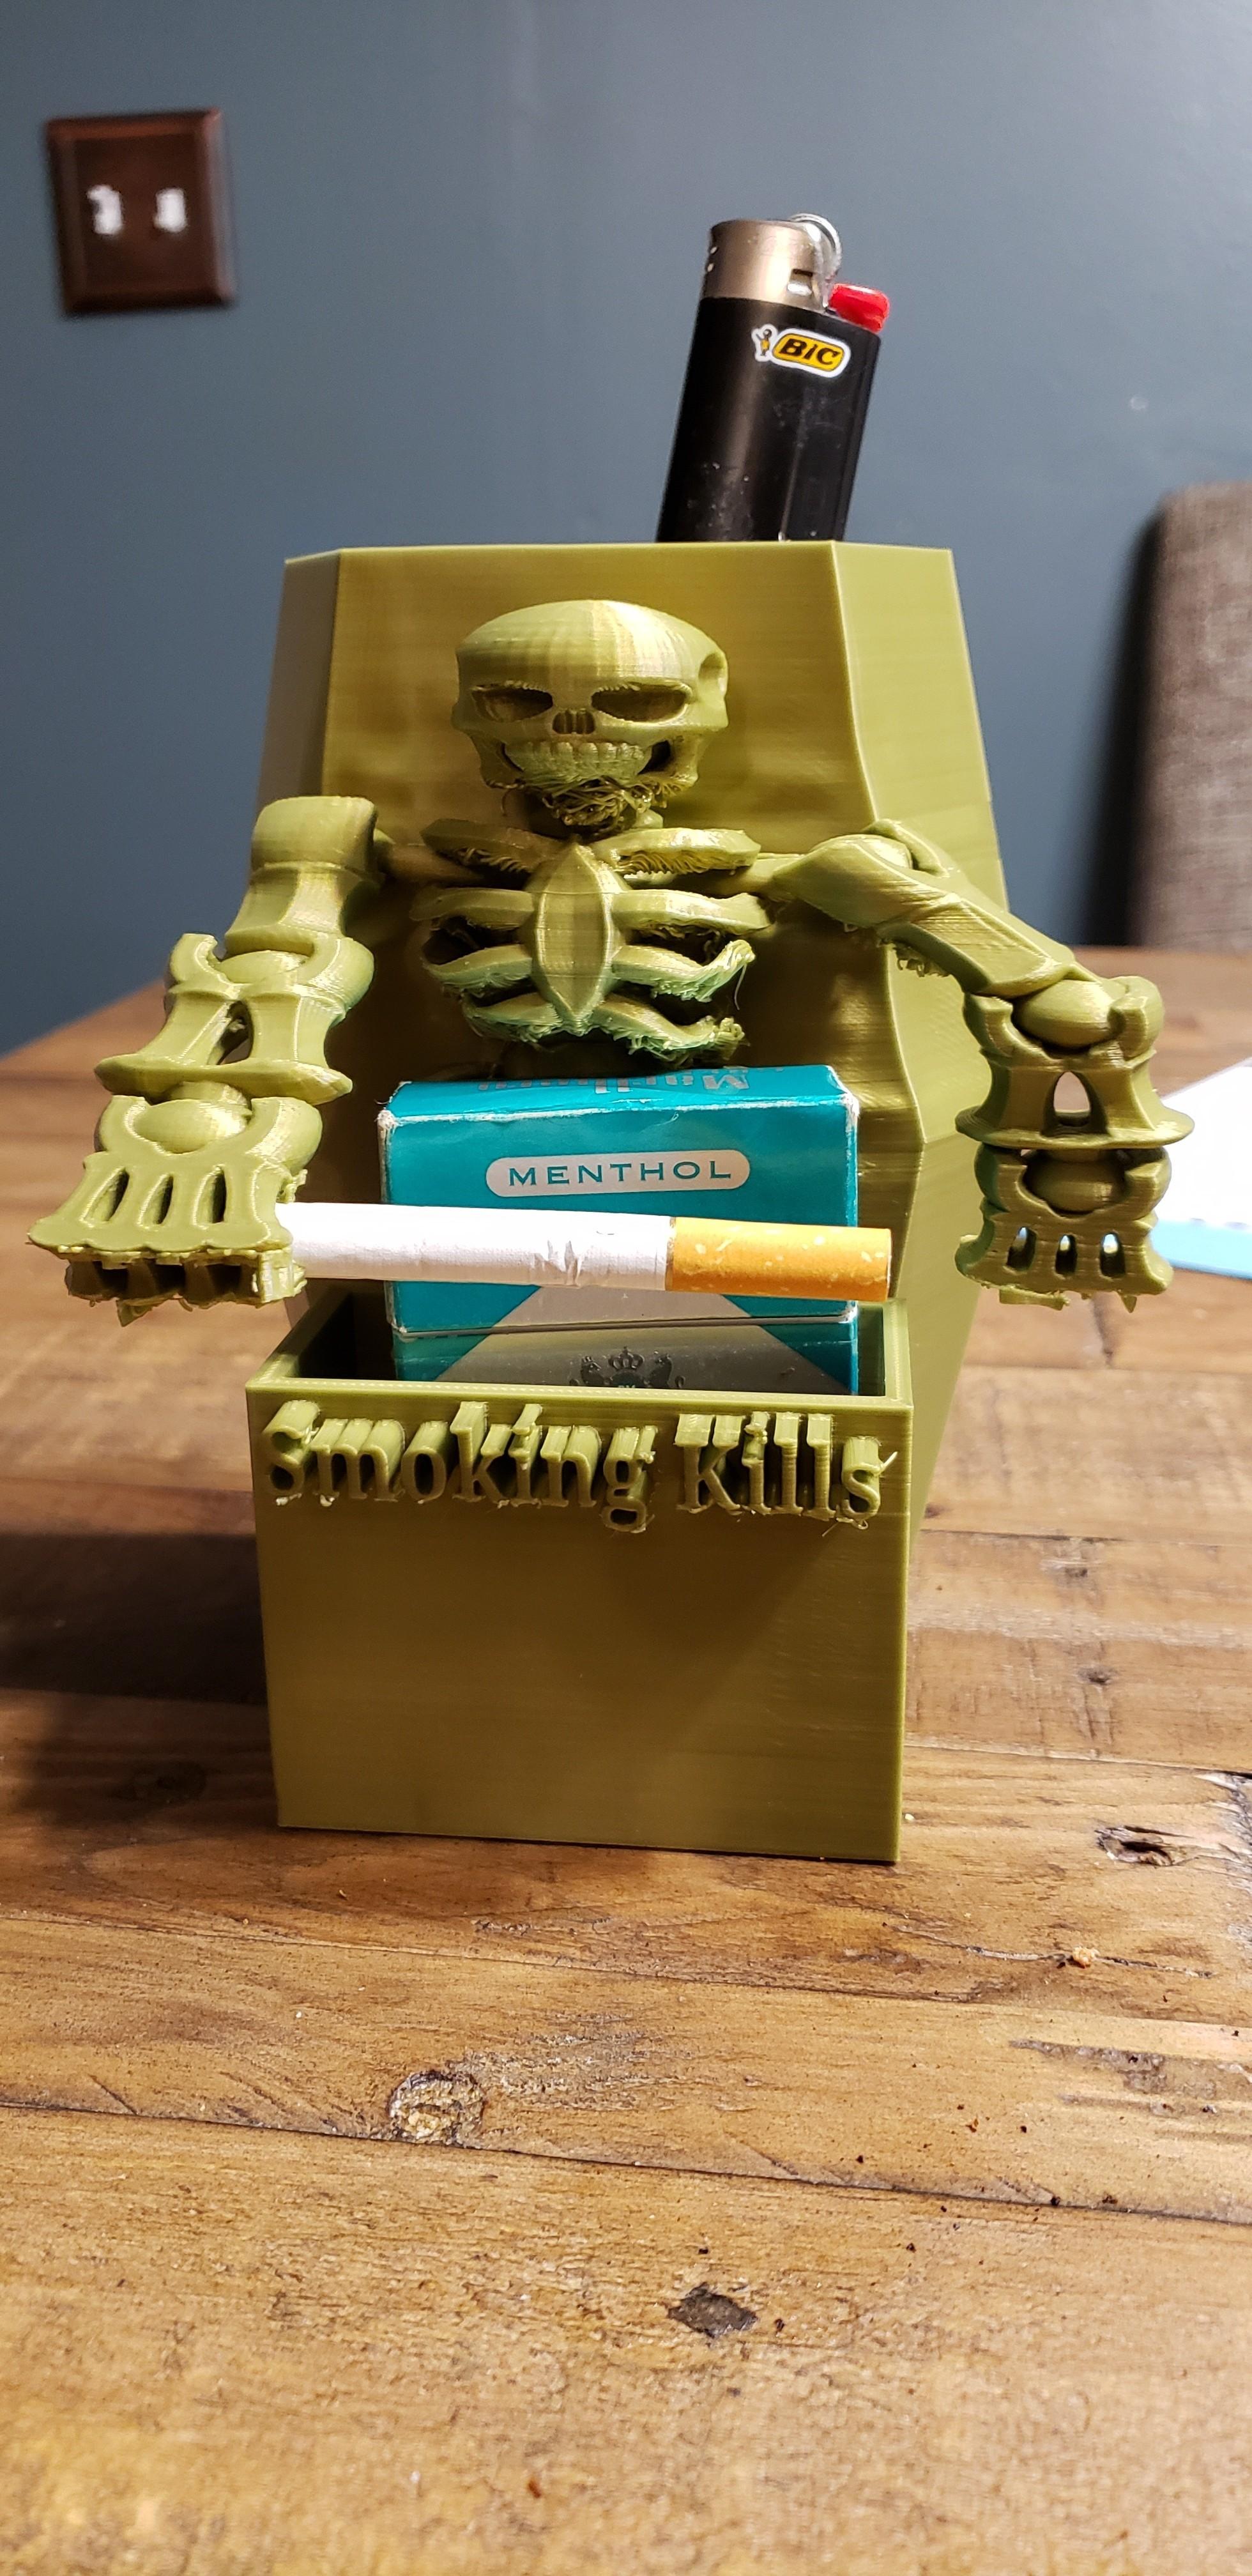 20190404_203819.jpg Download free STL file #XYZCHALLENGE Smoking Kills Cigarette Pack Holder • 3D printable template, ED2014